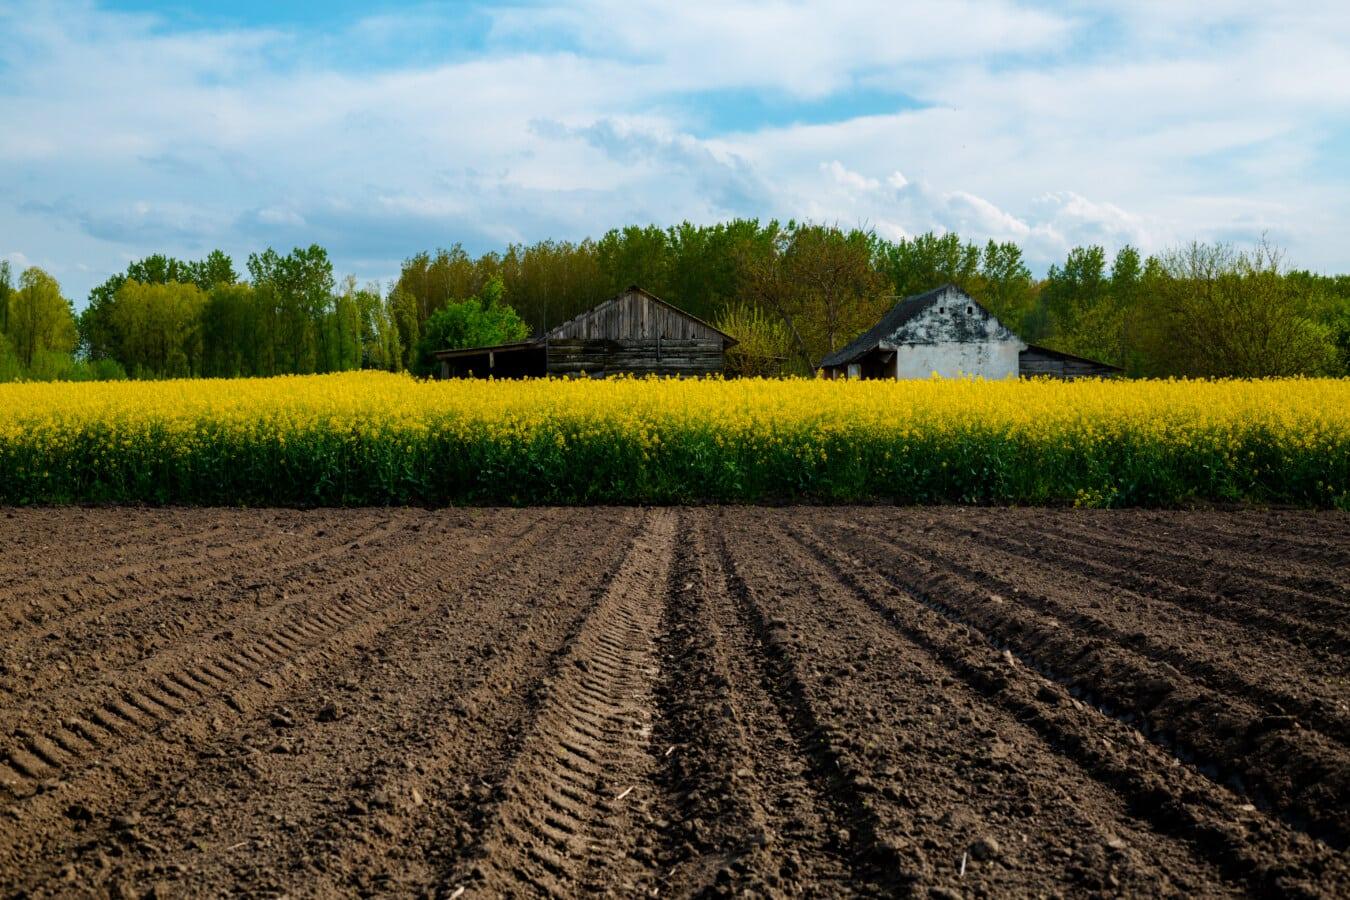 Agriculture, colza, rural, paysage, ferme, sol, domaine, sol, culture, nature